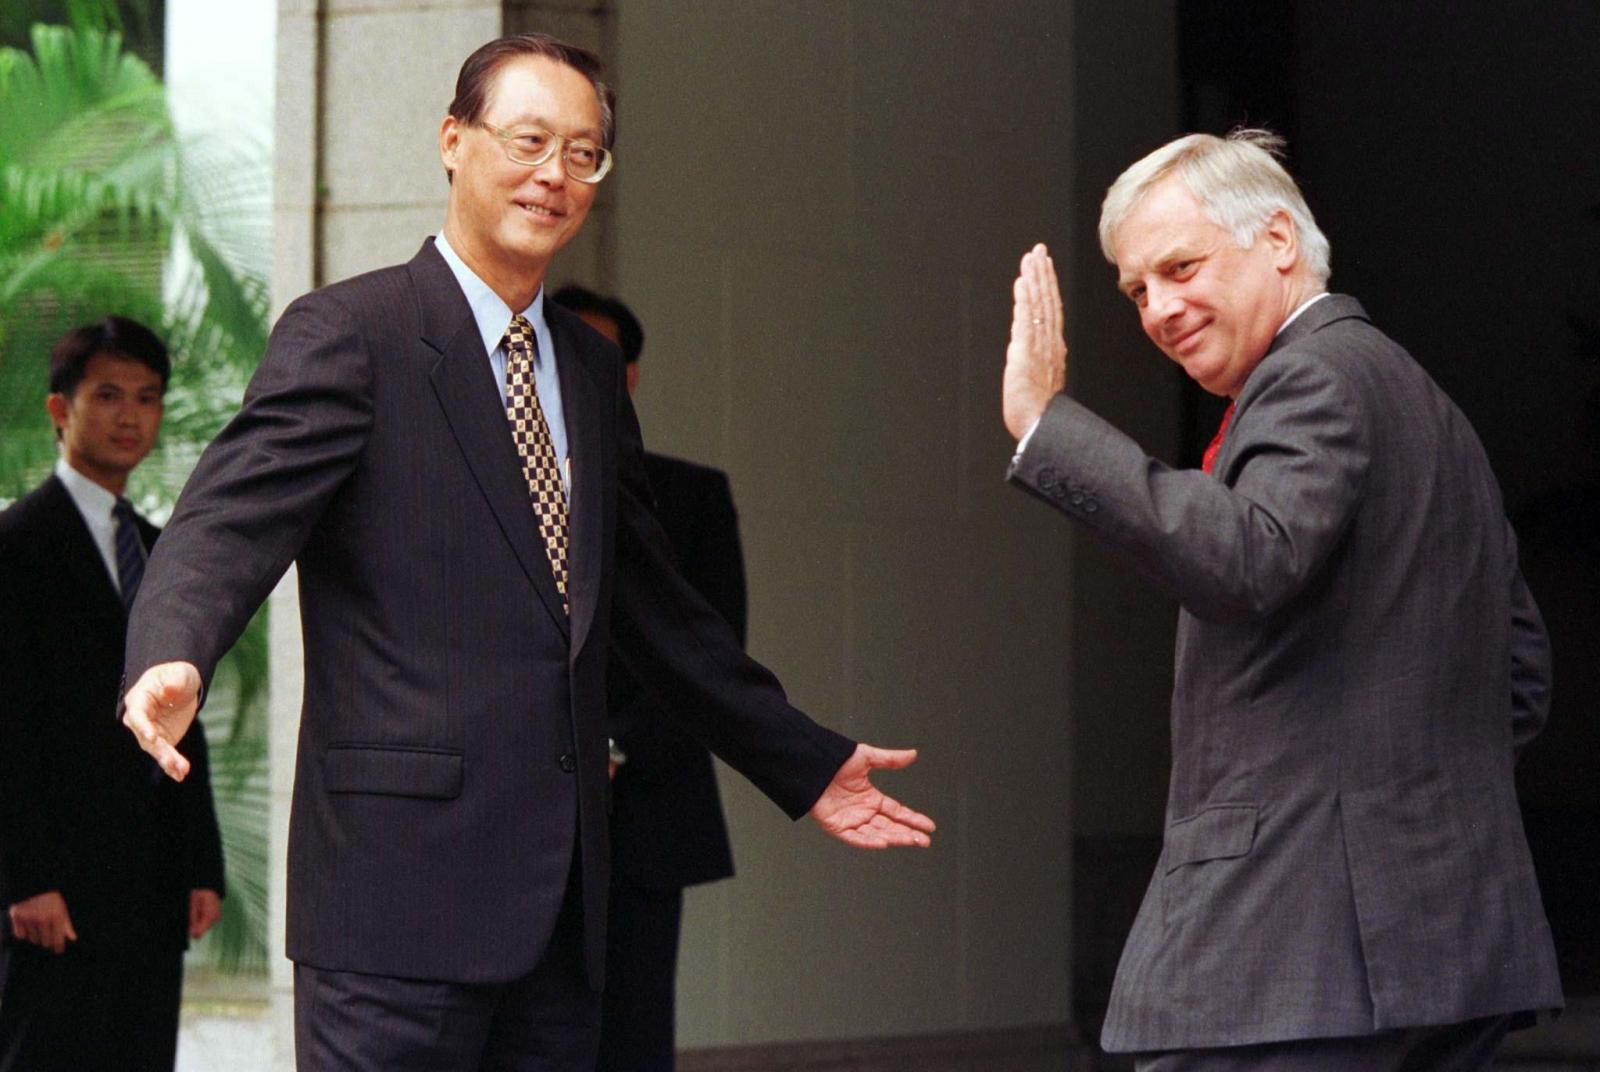 Goh Chok Tong and Chris Patten